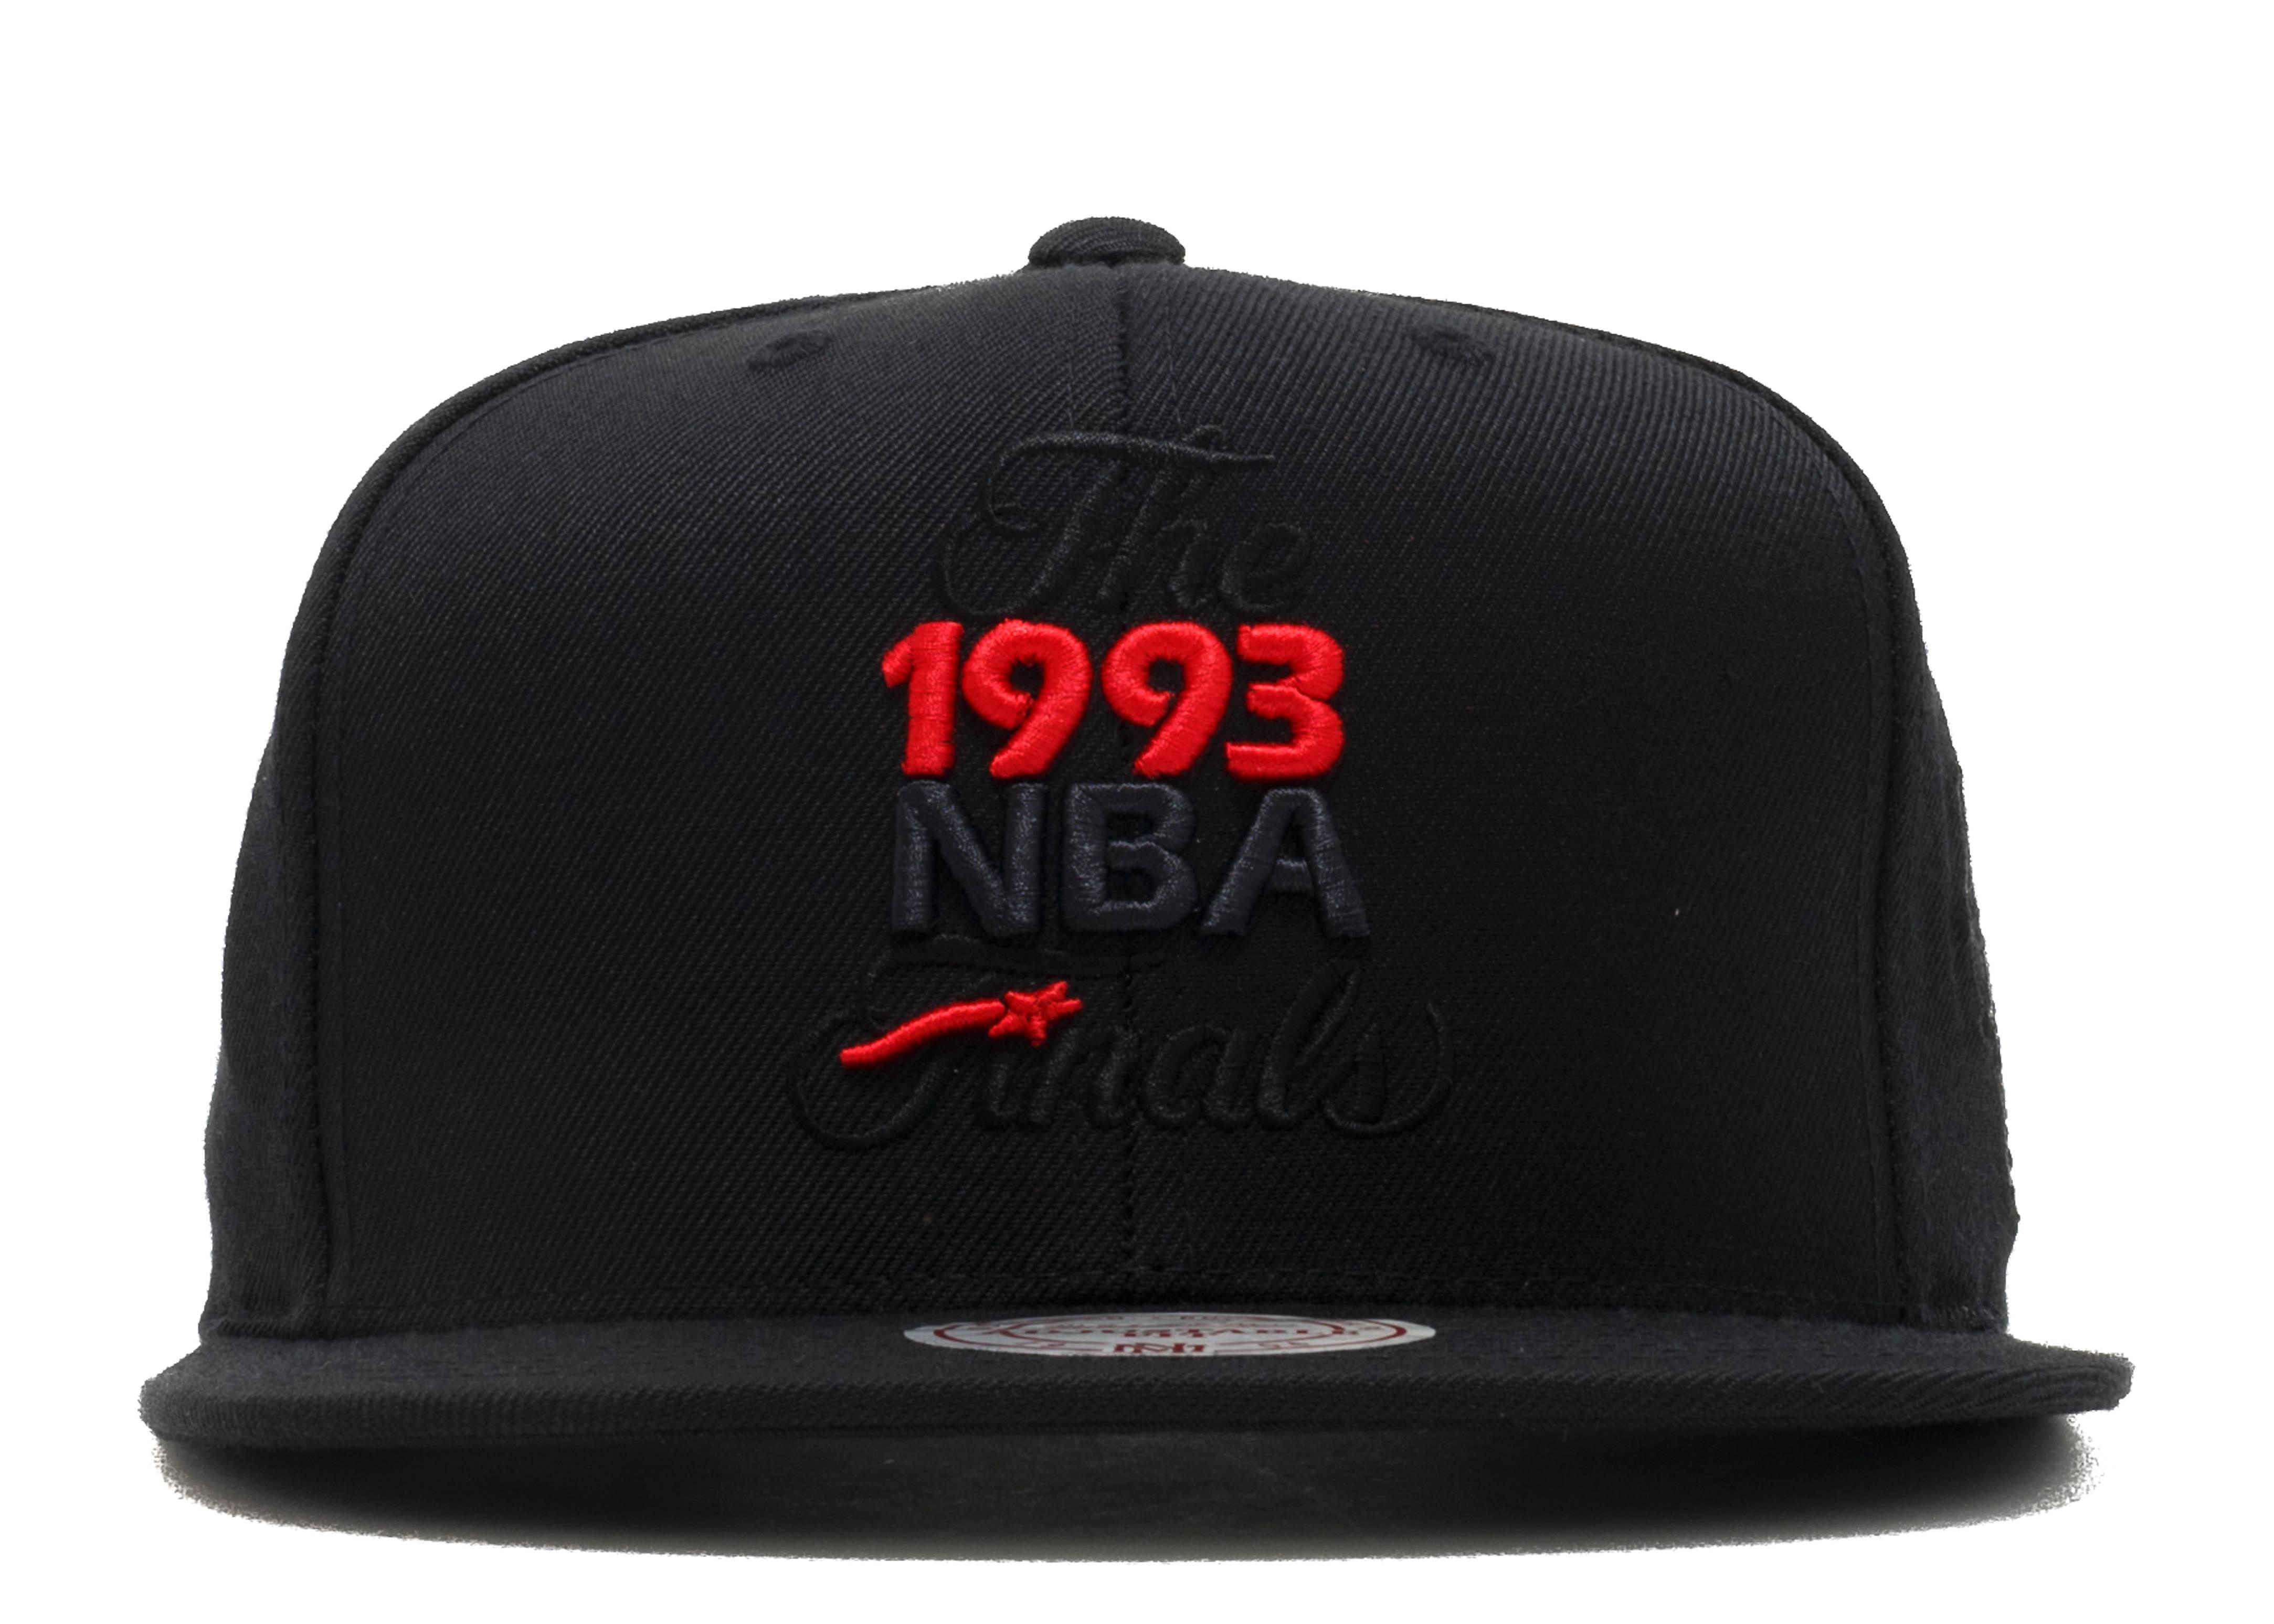 59c06aa2f47 Chicago Bulls Snap-back